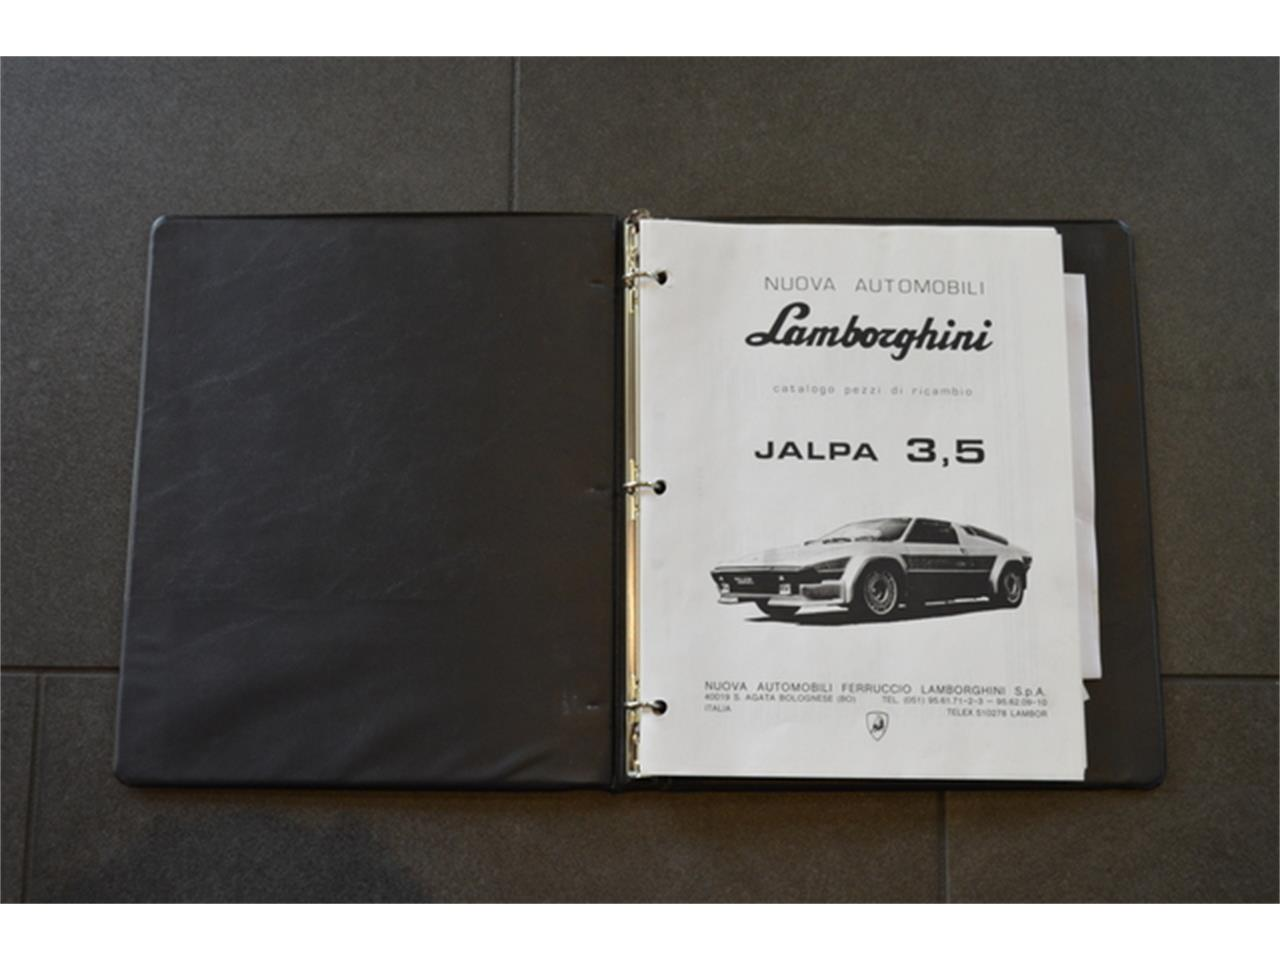 Large Picture of 1987 Lamborghini Jalpa Auction Vehicle Offered by Autosport Designs Inc - M6IZ